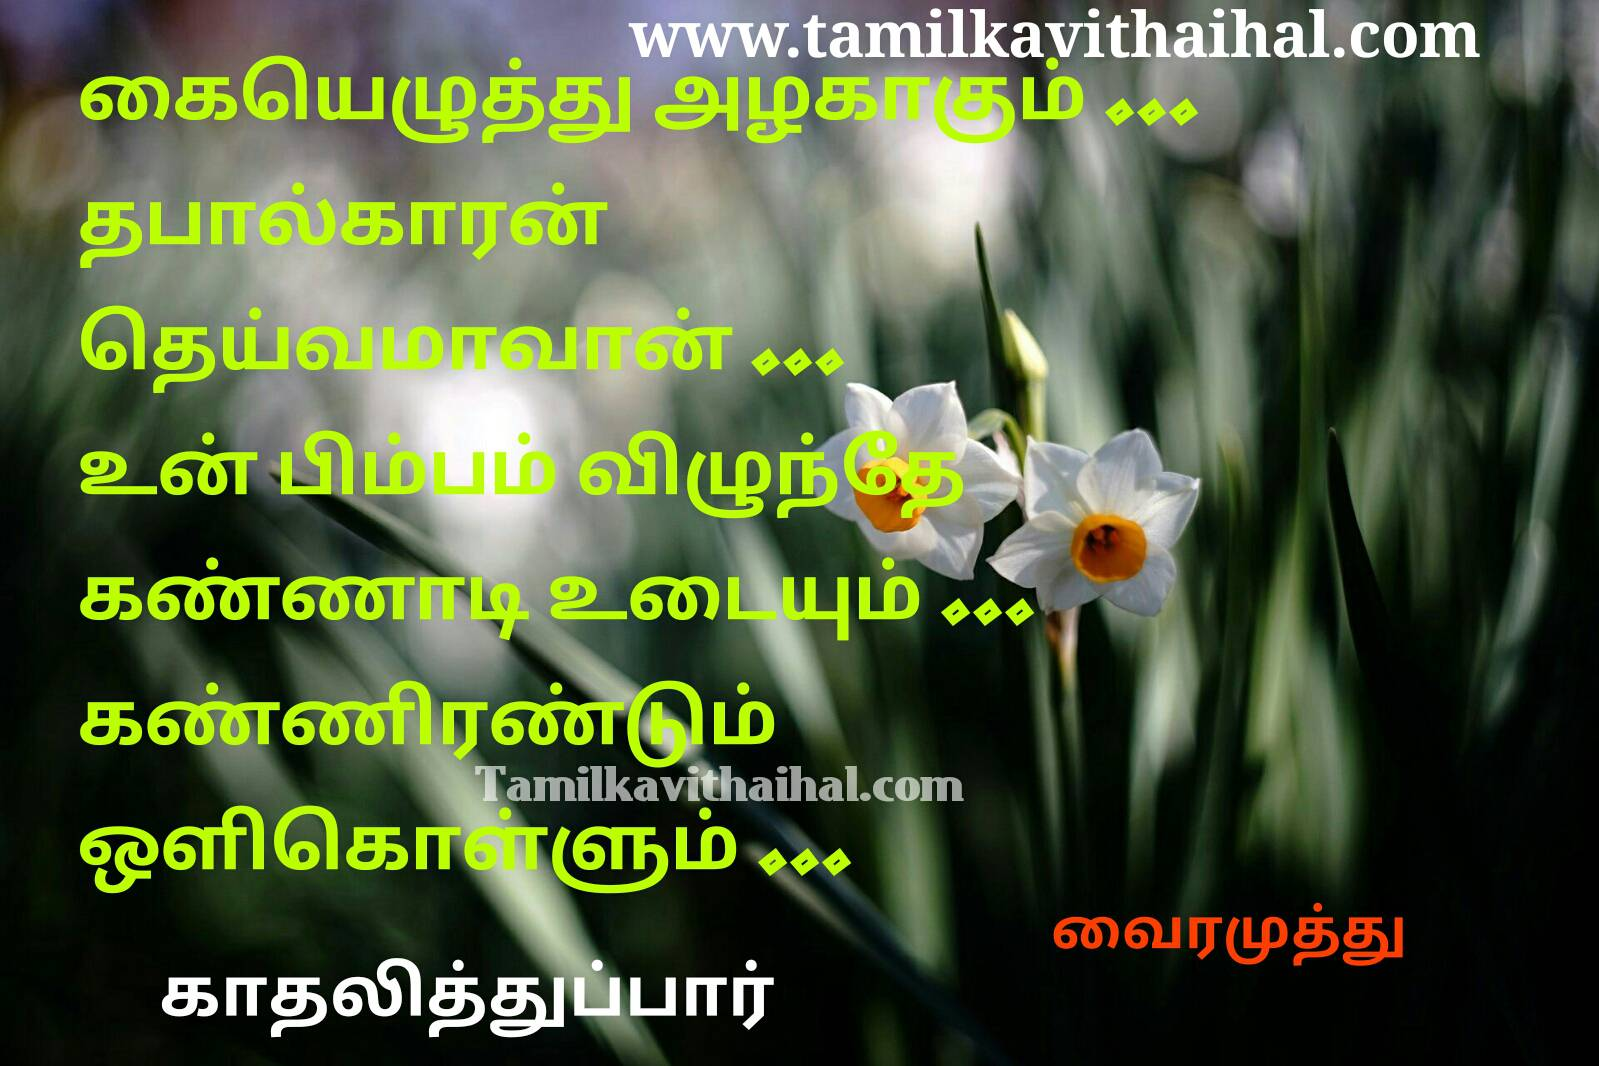 Beautiful love proposal vairamuthu kadhal kavithaigal kaieluthu alaku un bimbam vilunthu kannadi udaiyum kadhalithupar image downlaod